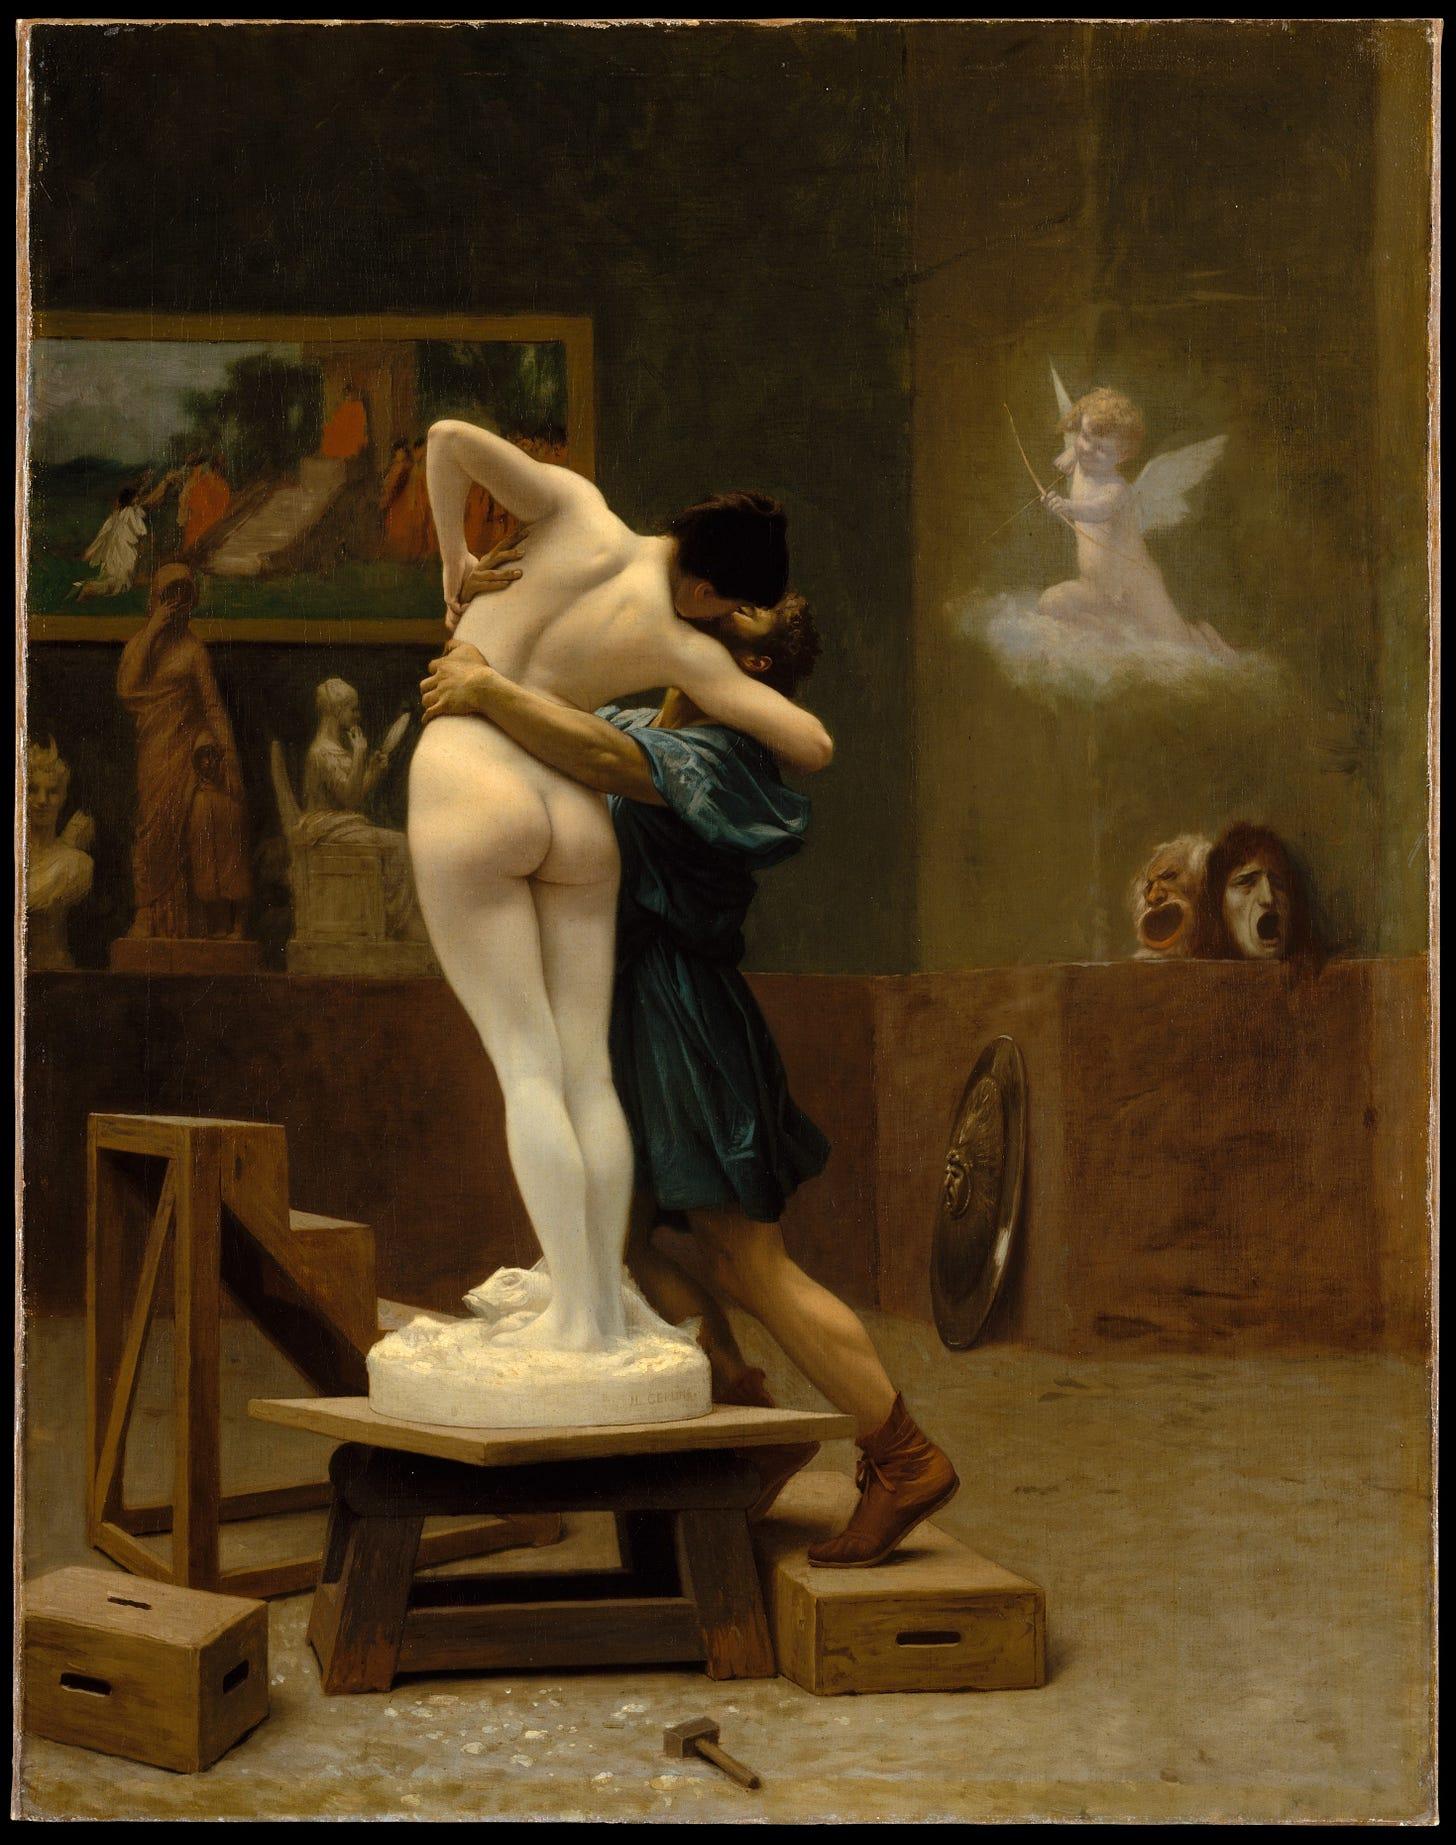 Pygmalion and Galatea (Gérôme painting) - Wikipedia